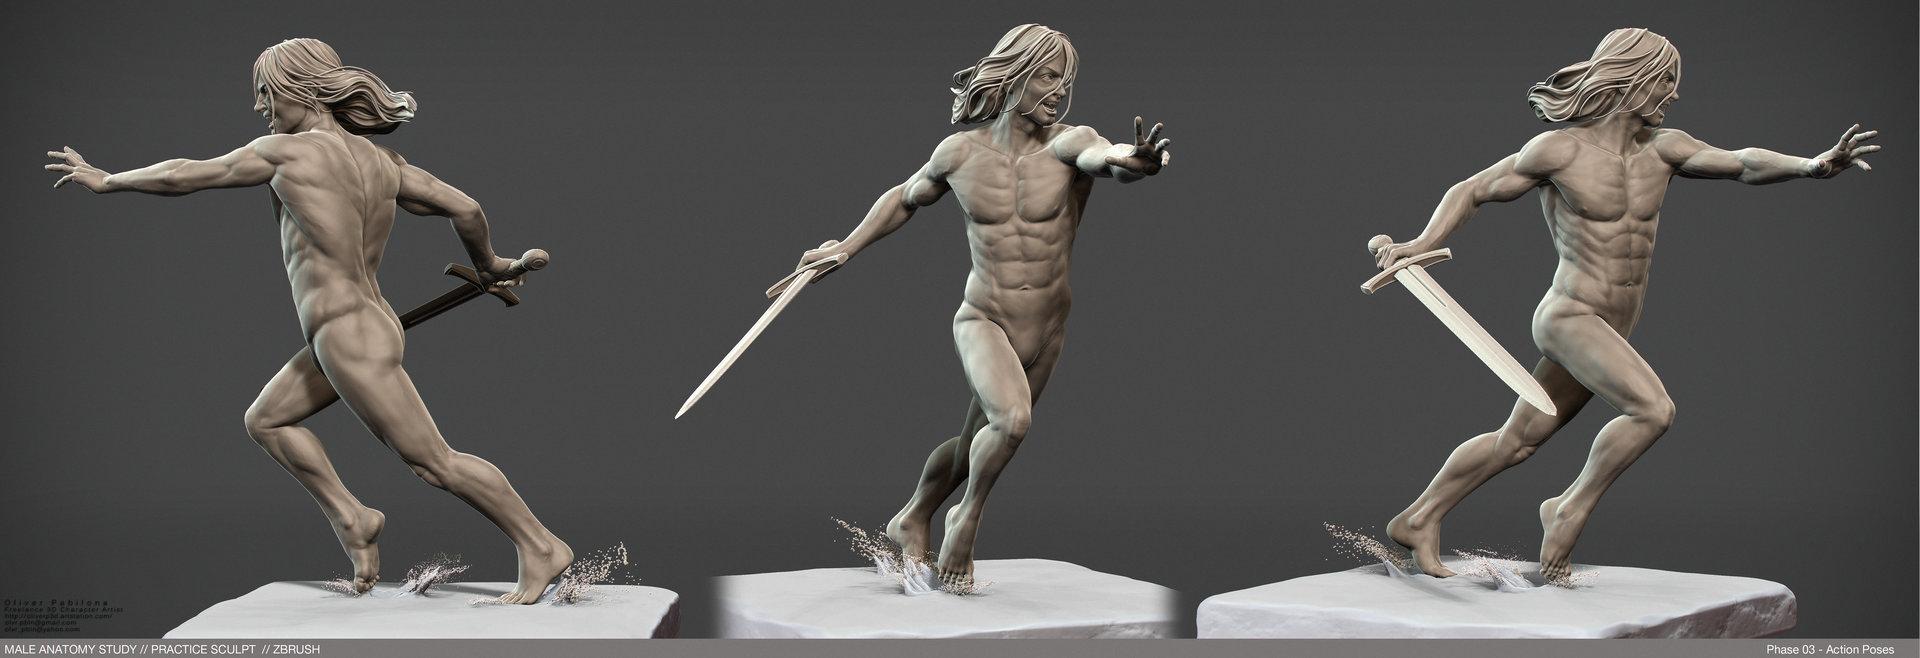 ArtStation - WIP - Male Anatomy Study - Base Forms / Details ...